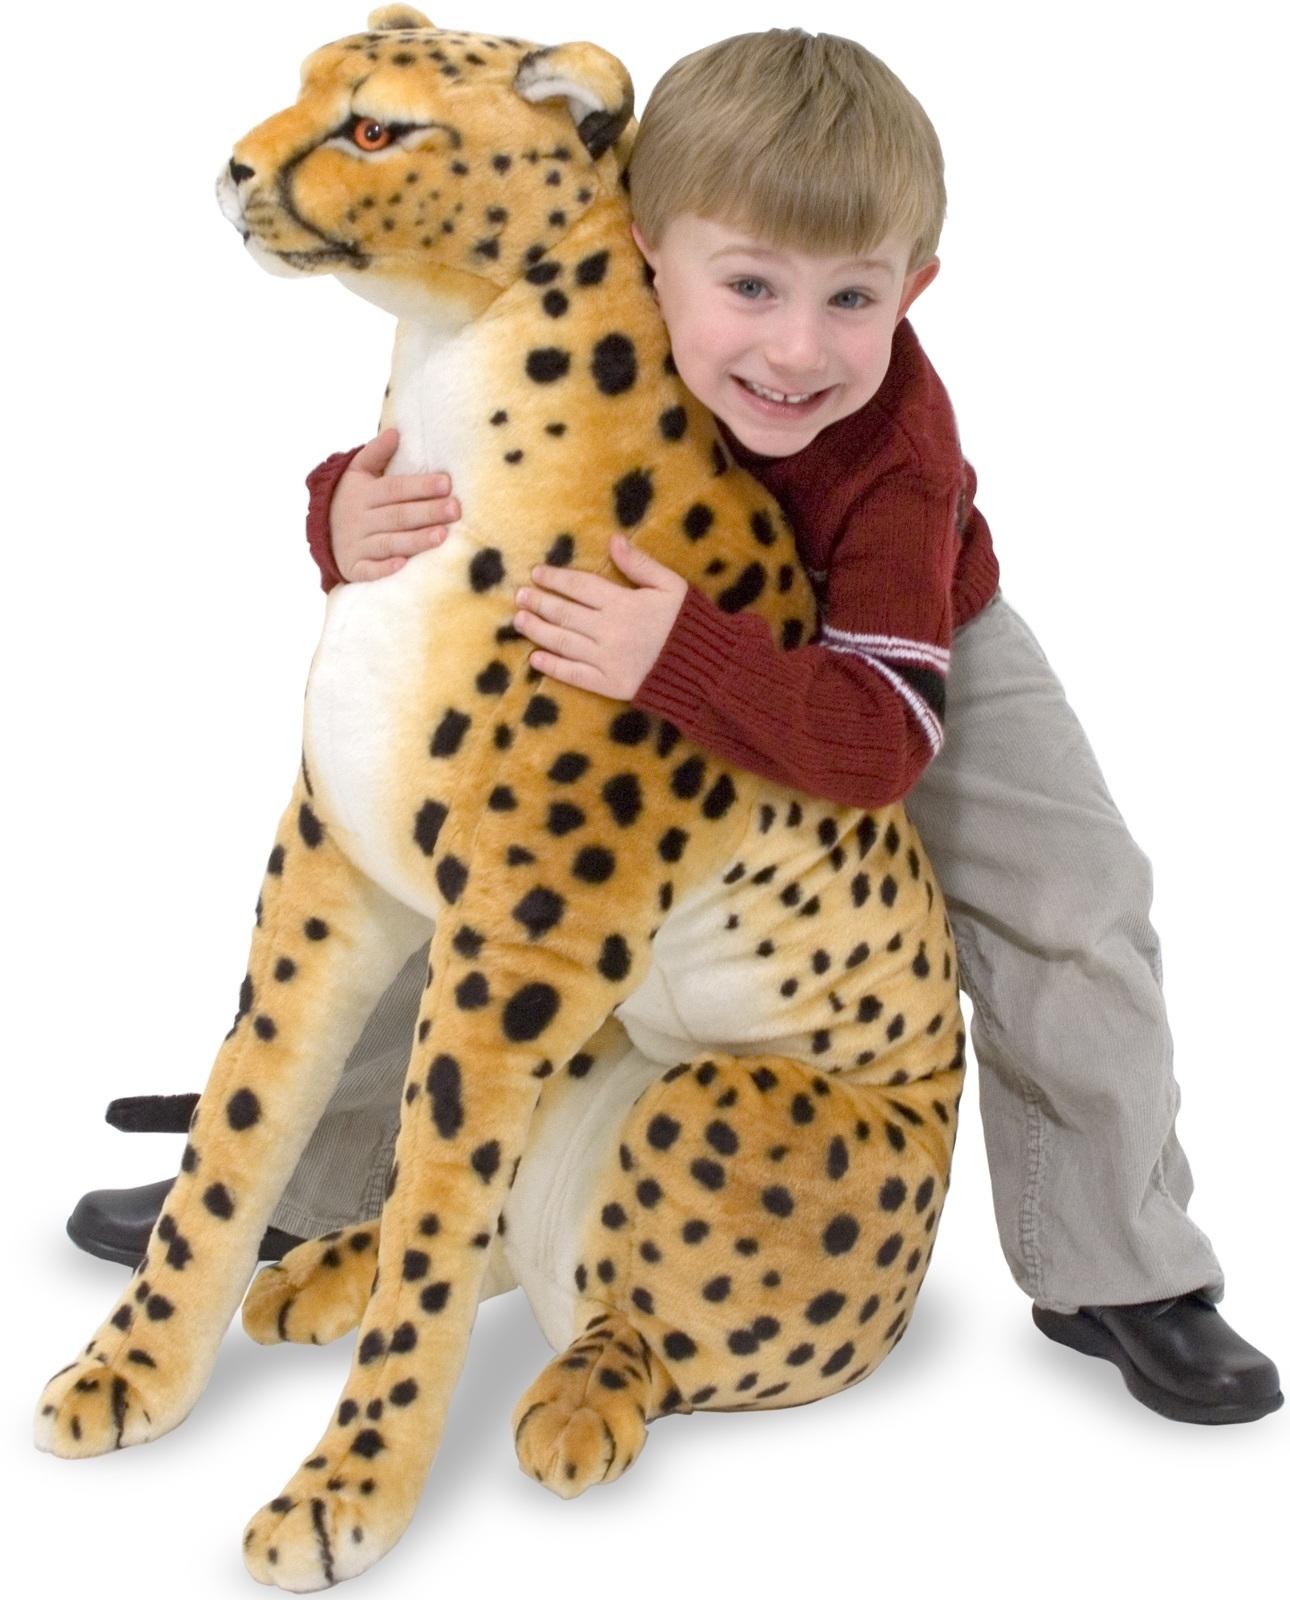 Cheetah Giant Stuffed Animal Plush - Melissa & Doug image